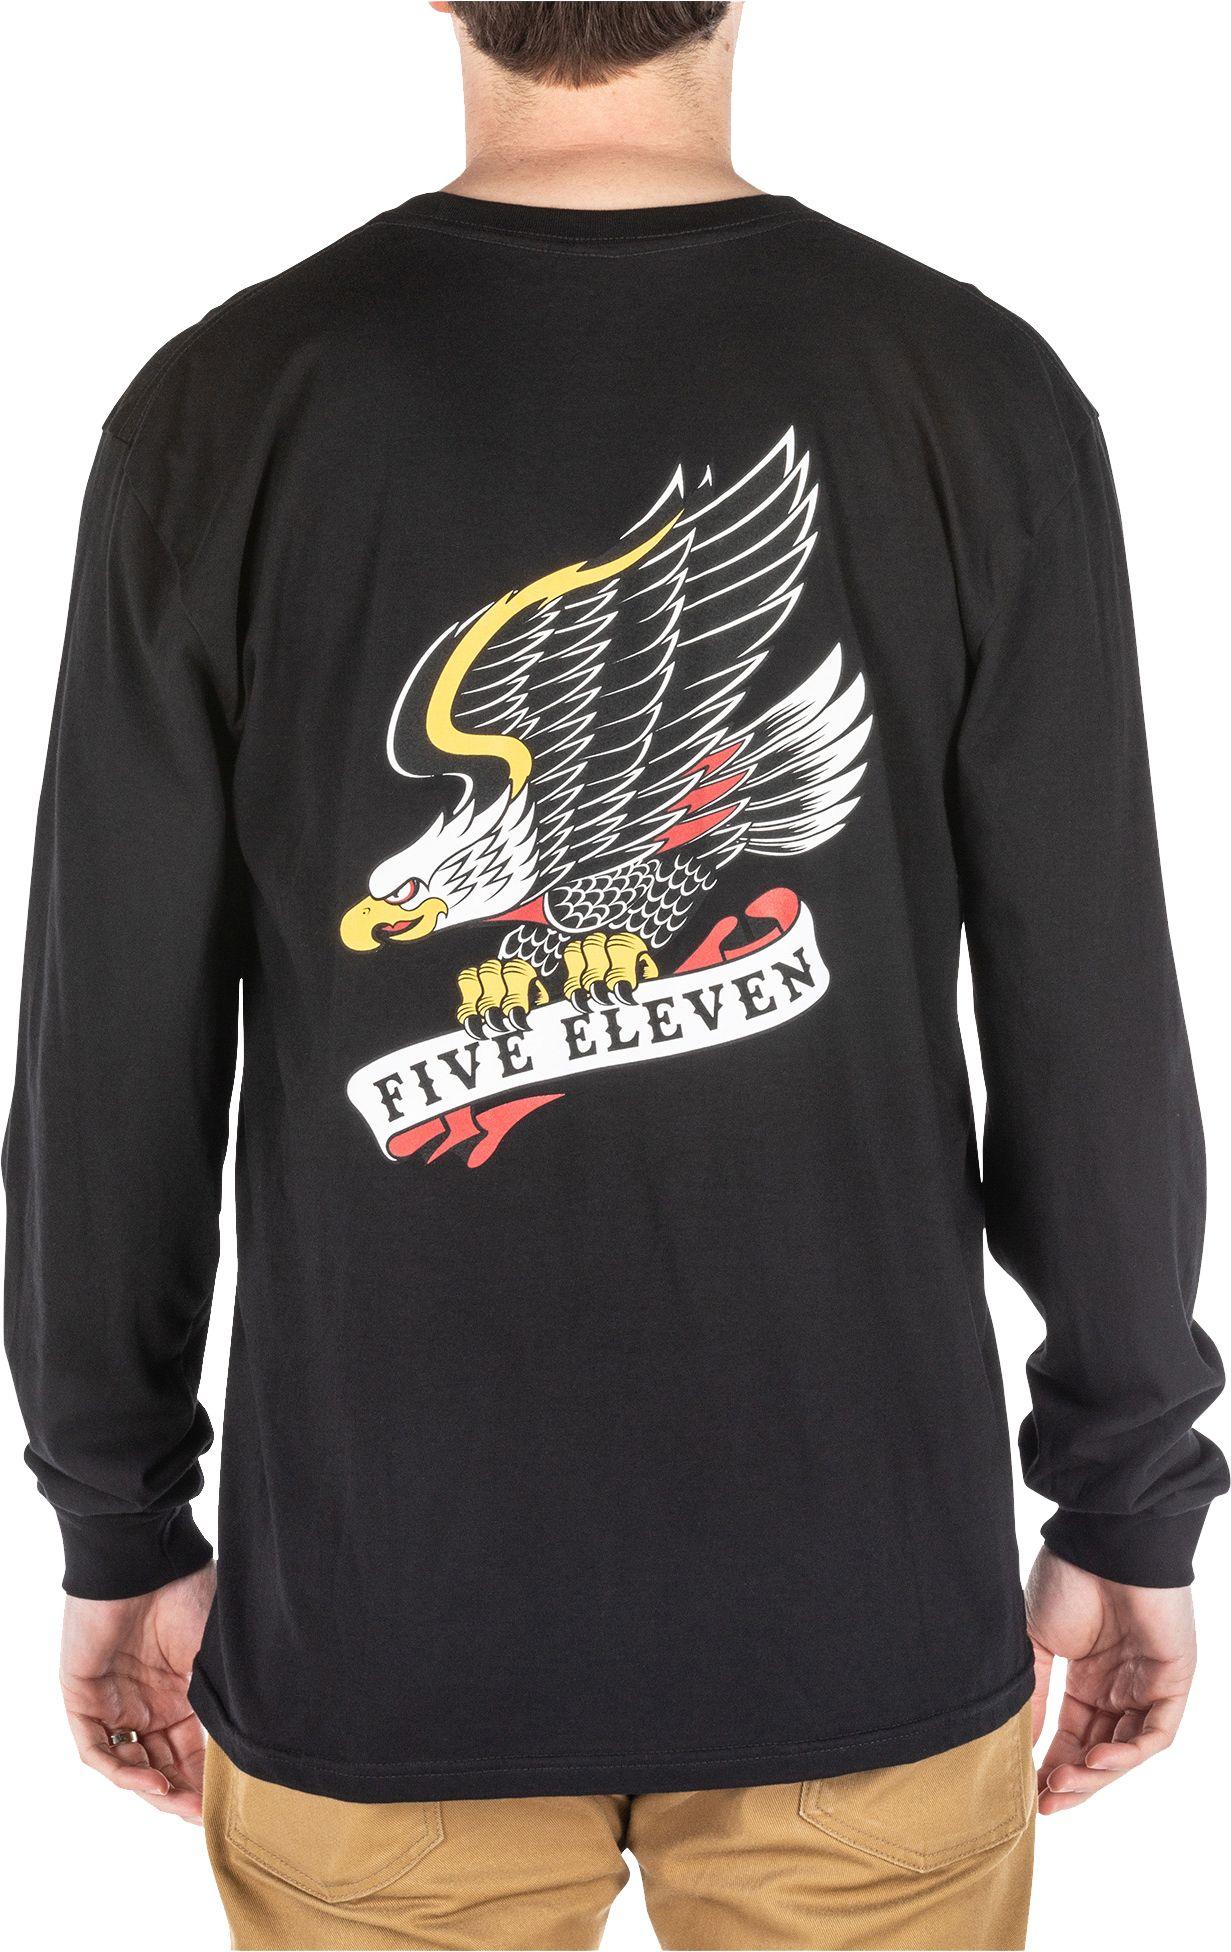 Men's 5.11 Tactical Jerry Eagle Long Sleeve T-Shirt, Large, Black